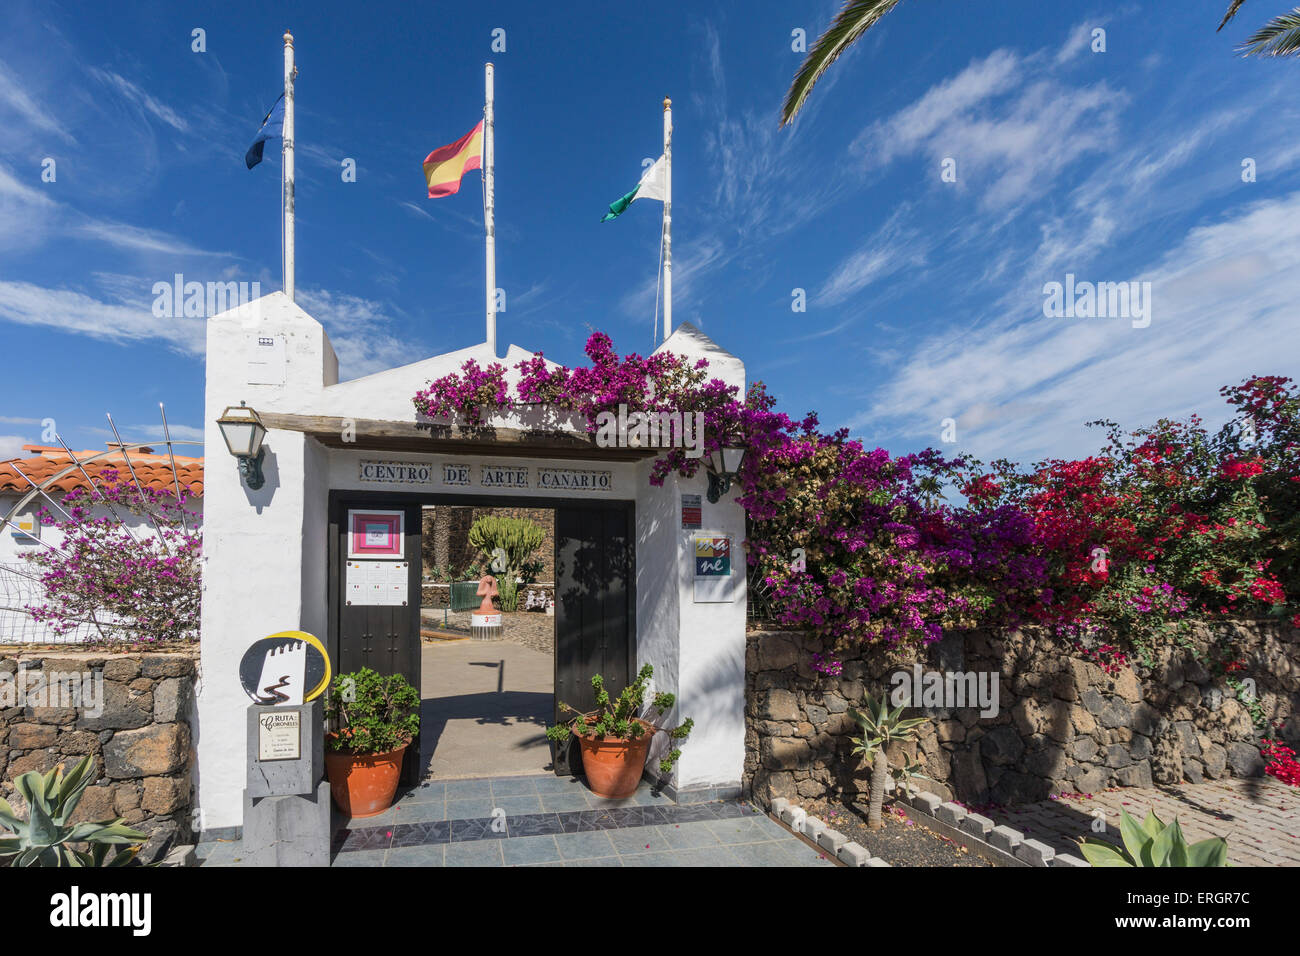 Centro de Arte Canario, Art Museum, La Oliva, Fuerteventura, Canary Islands, Spain - Stock Image